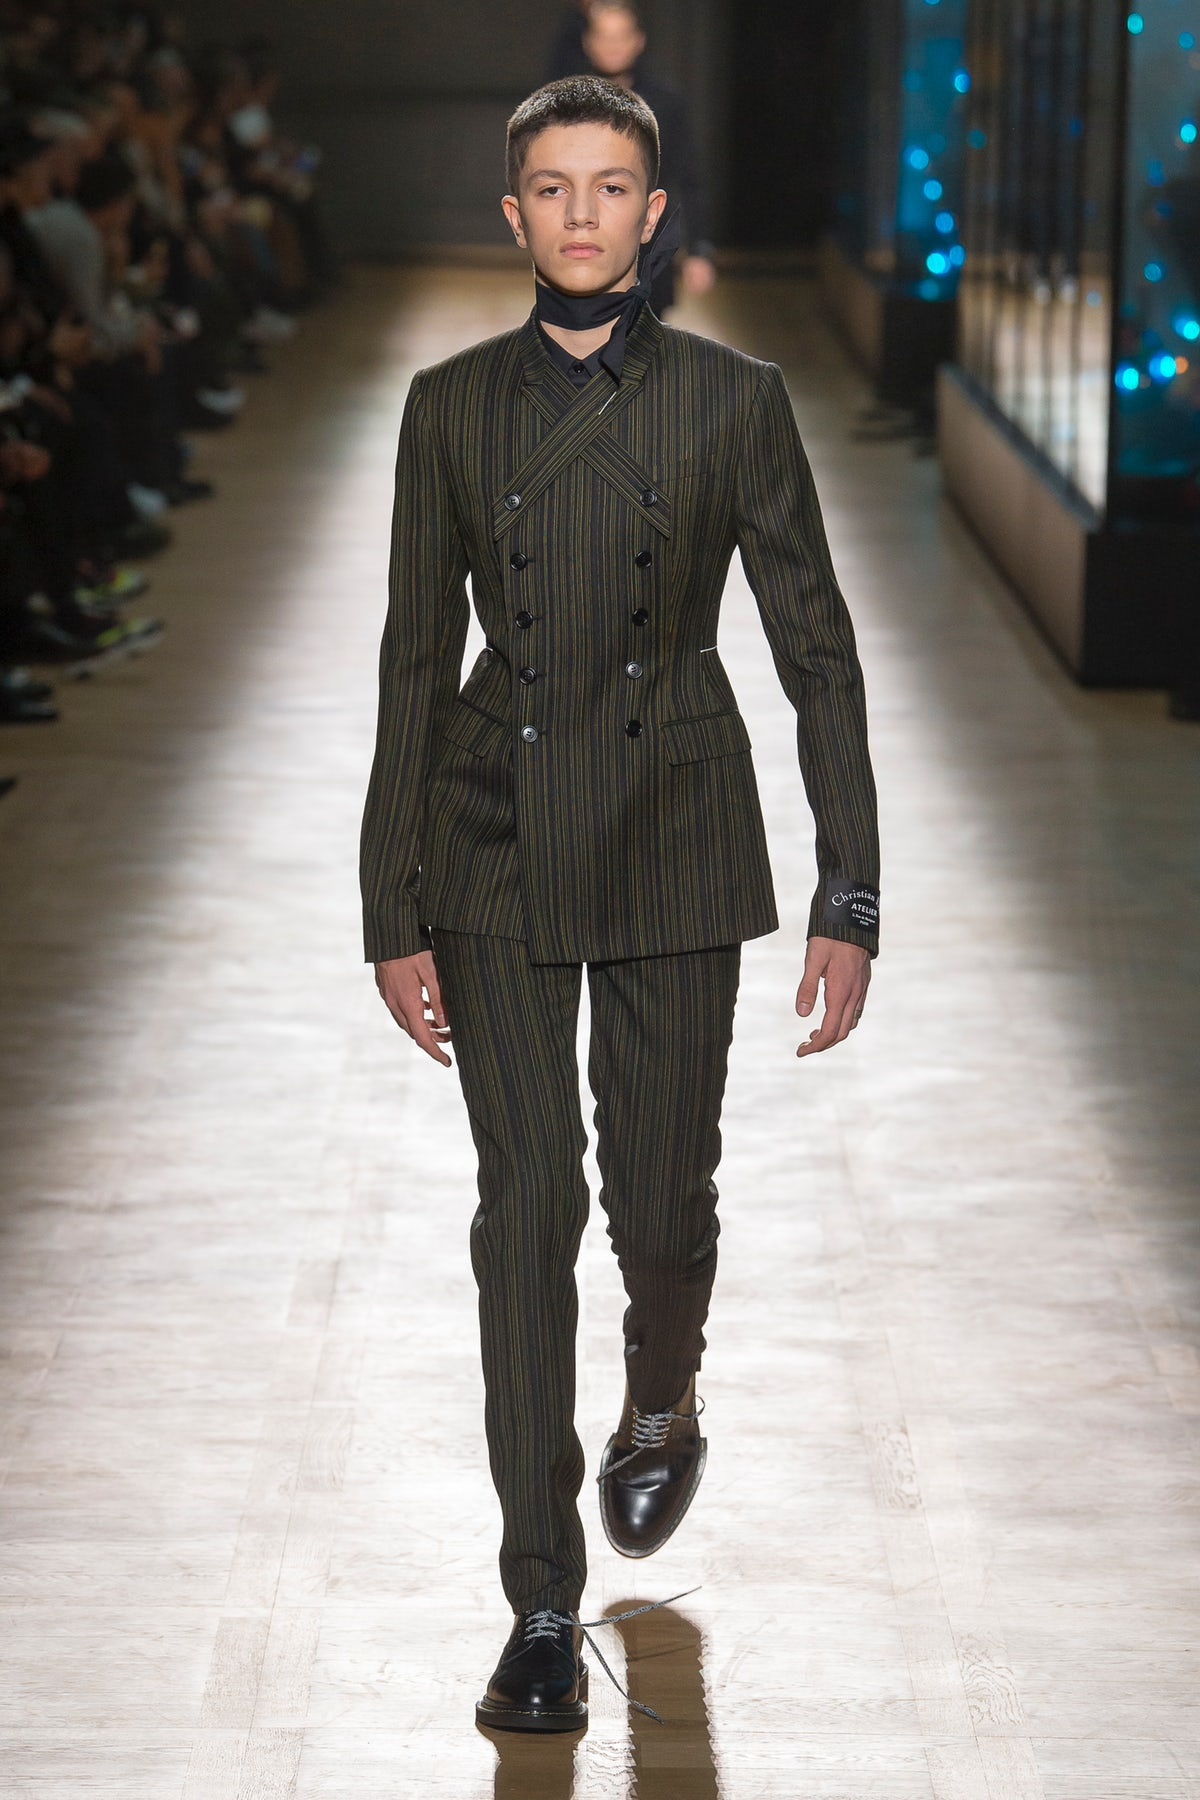 dior_homme_look_42_menswear_autumn_2018.jpeg